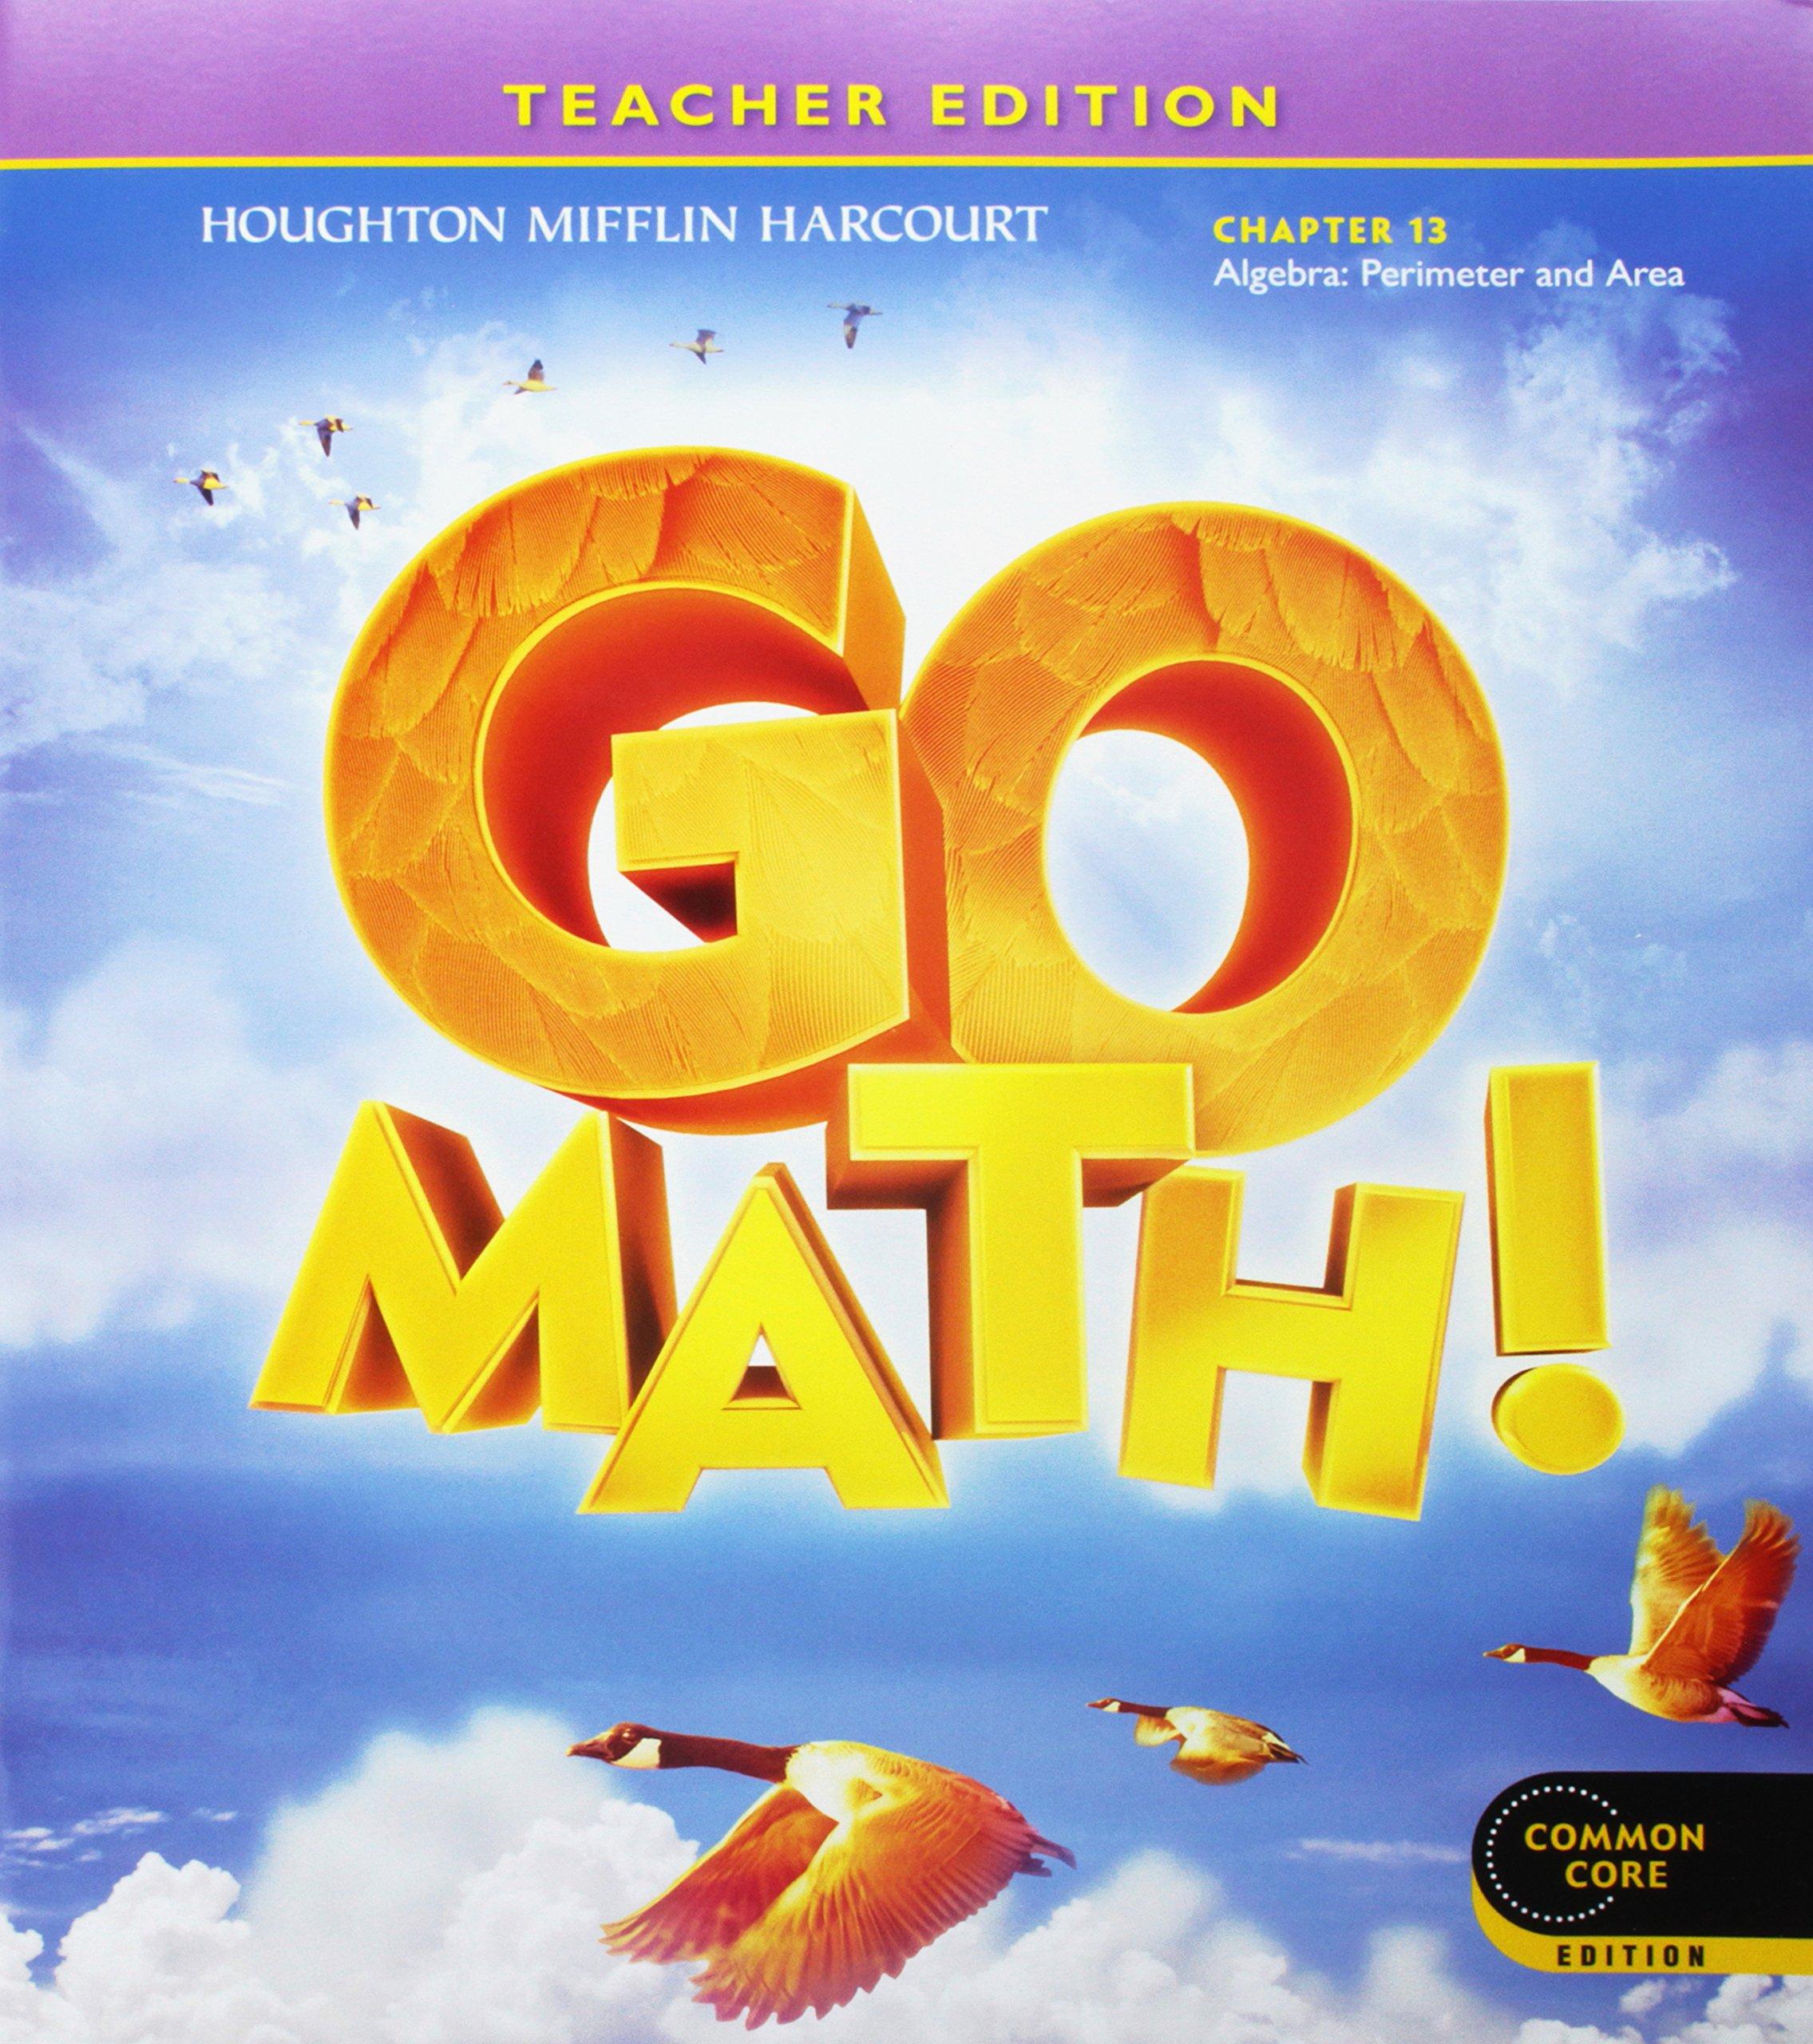 Teacher Edition & Planning Guide Bundle Grade 4 2012 (9780547643120):  Houghton Mifflin Harcourt: Books